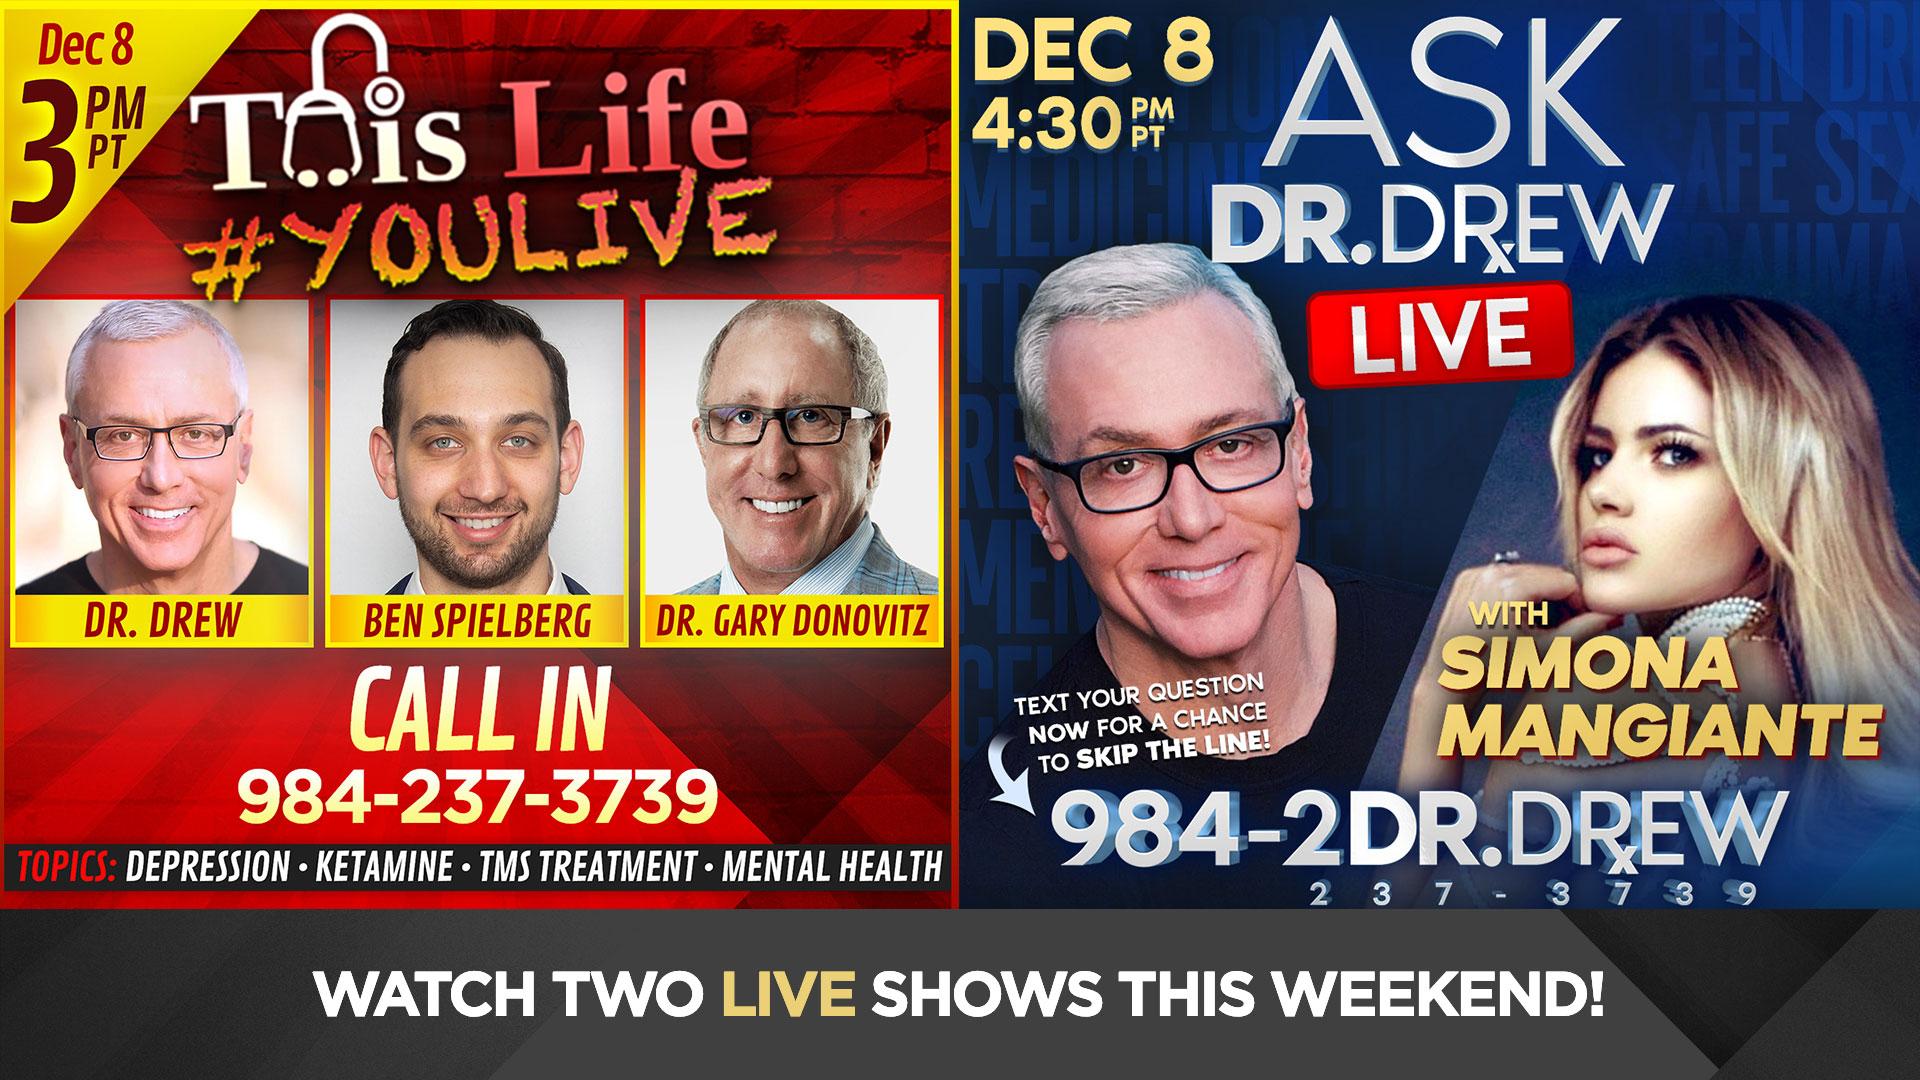 Dec 8: Taking Calls LIVE with Simona Mangiante, Ben Spielberg & Dr. Gary Donovitz